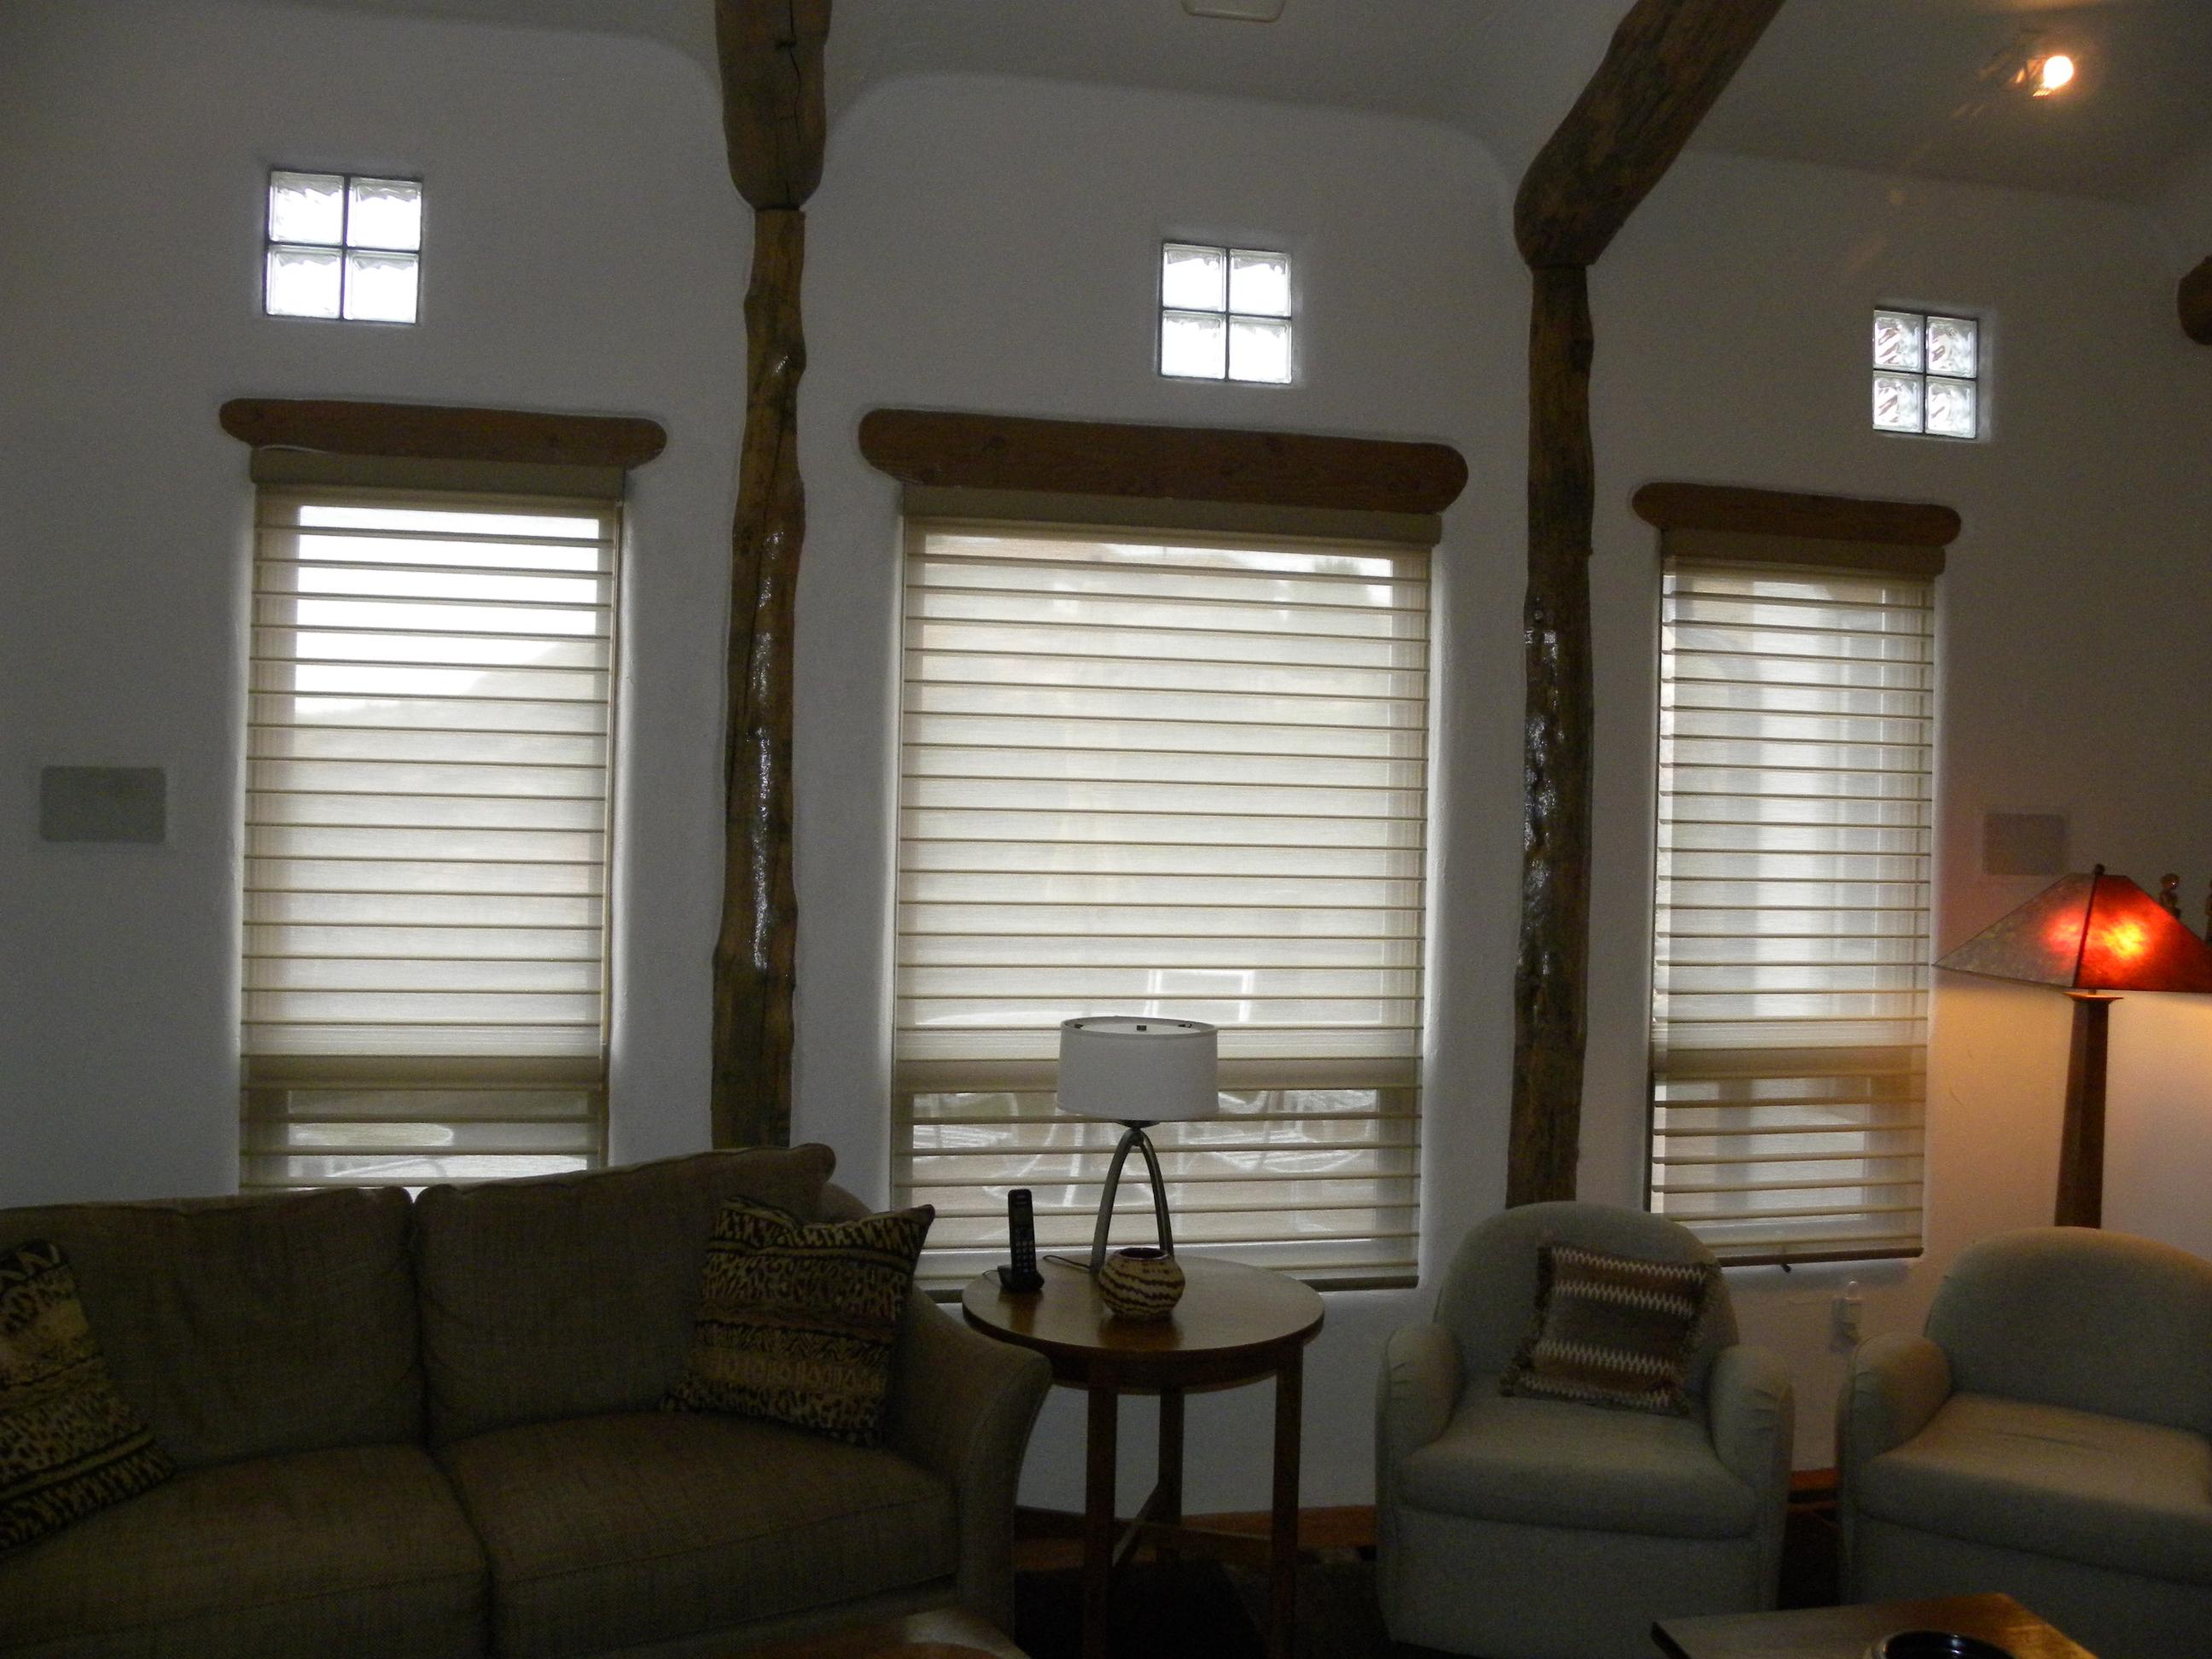 Duette Powerrise And Silhouette Powerrise Custom Window